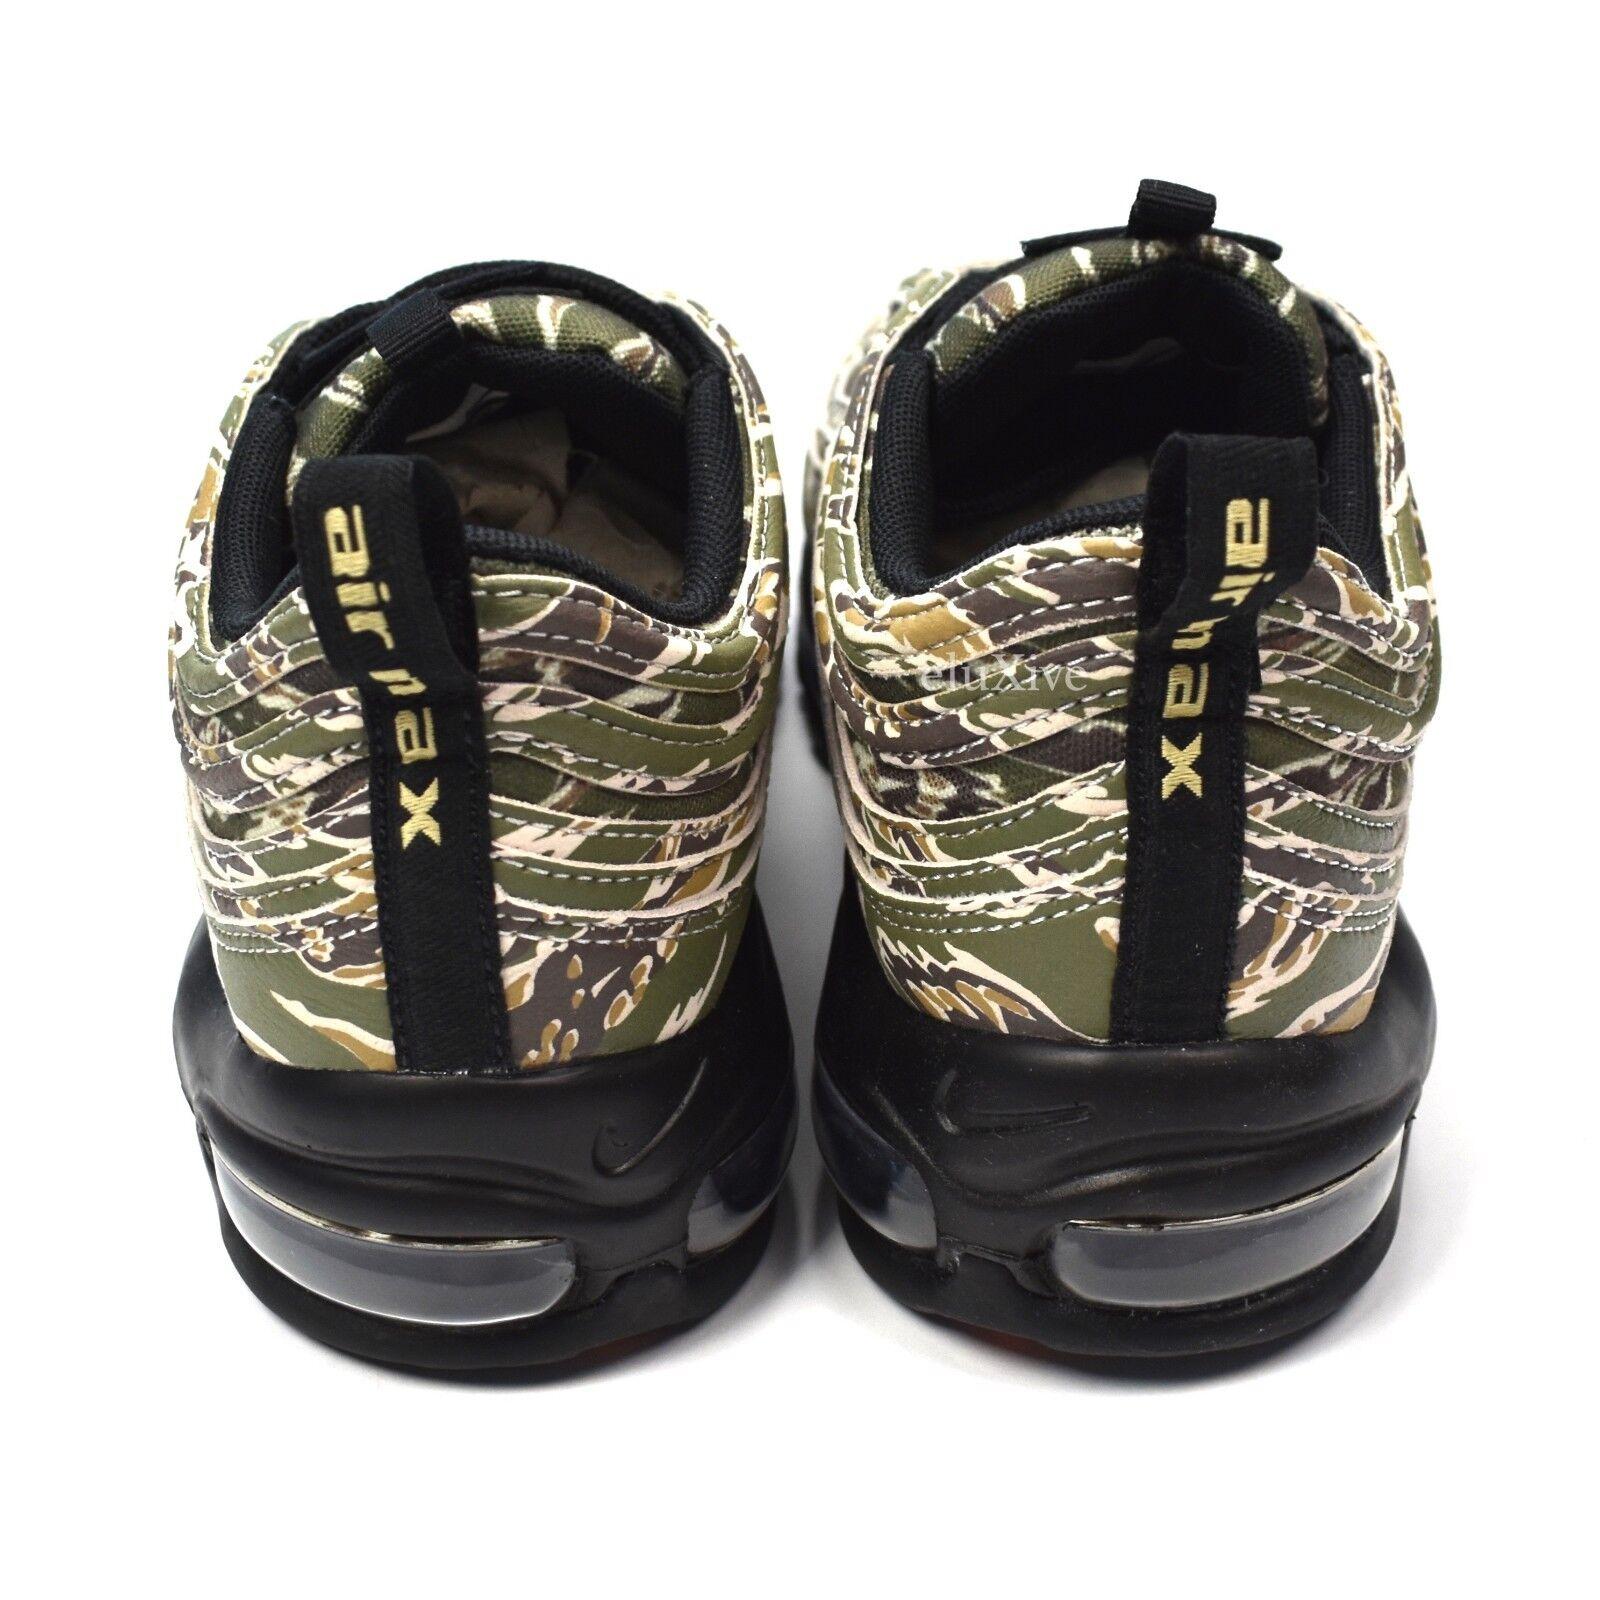 lower price with da1c4 8ac92 ... NWT Nike Air Max 97 país Camo Usa Usa Usa American Flag Hombres  Zapatillas Authentic casual ...